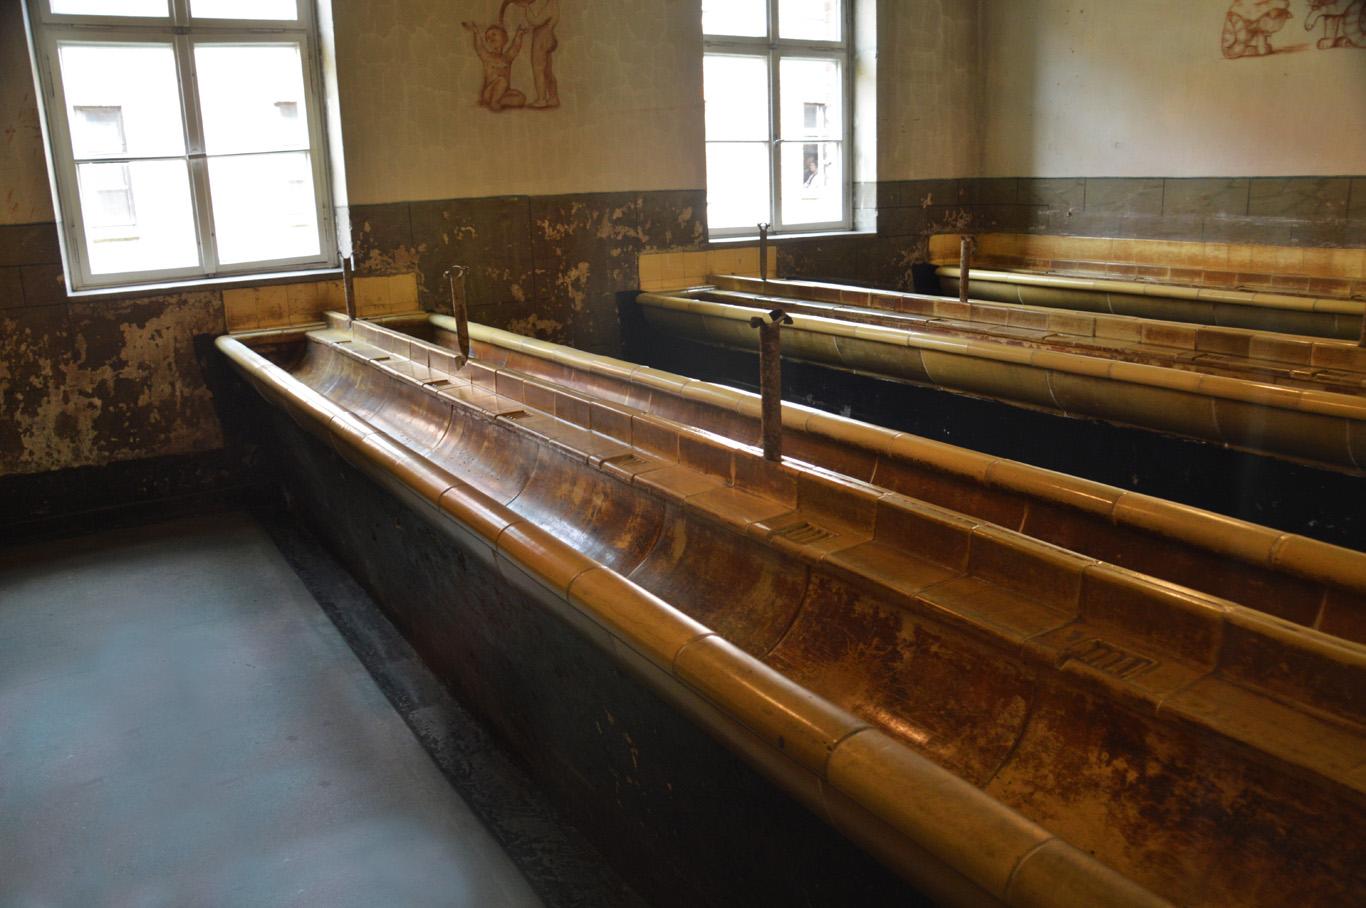 Bathroom in Auschwitz I